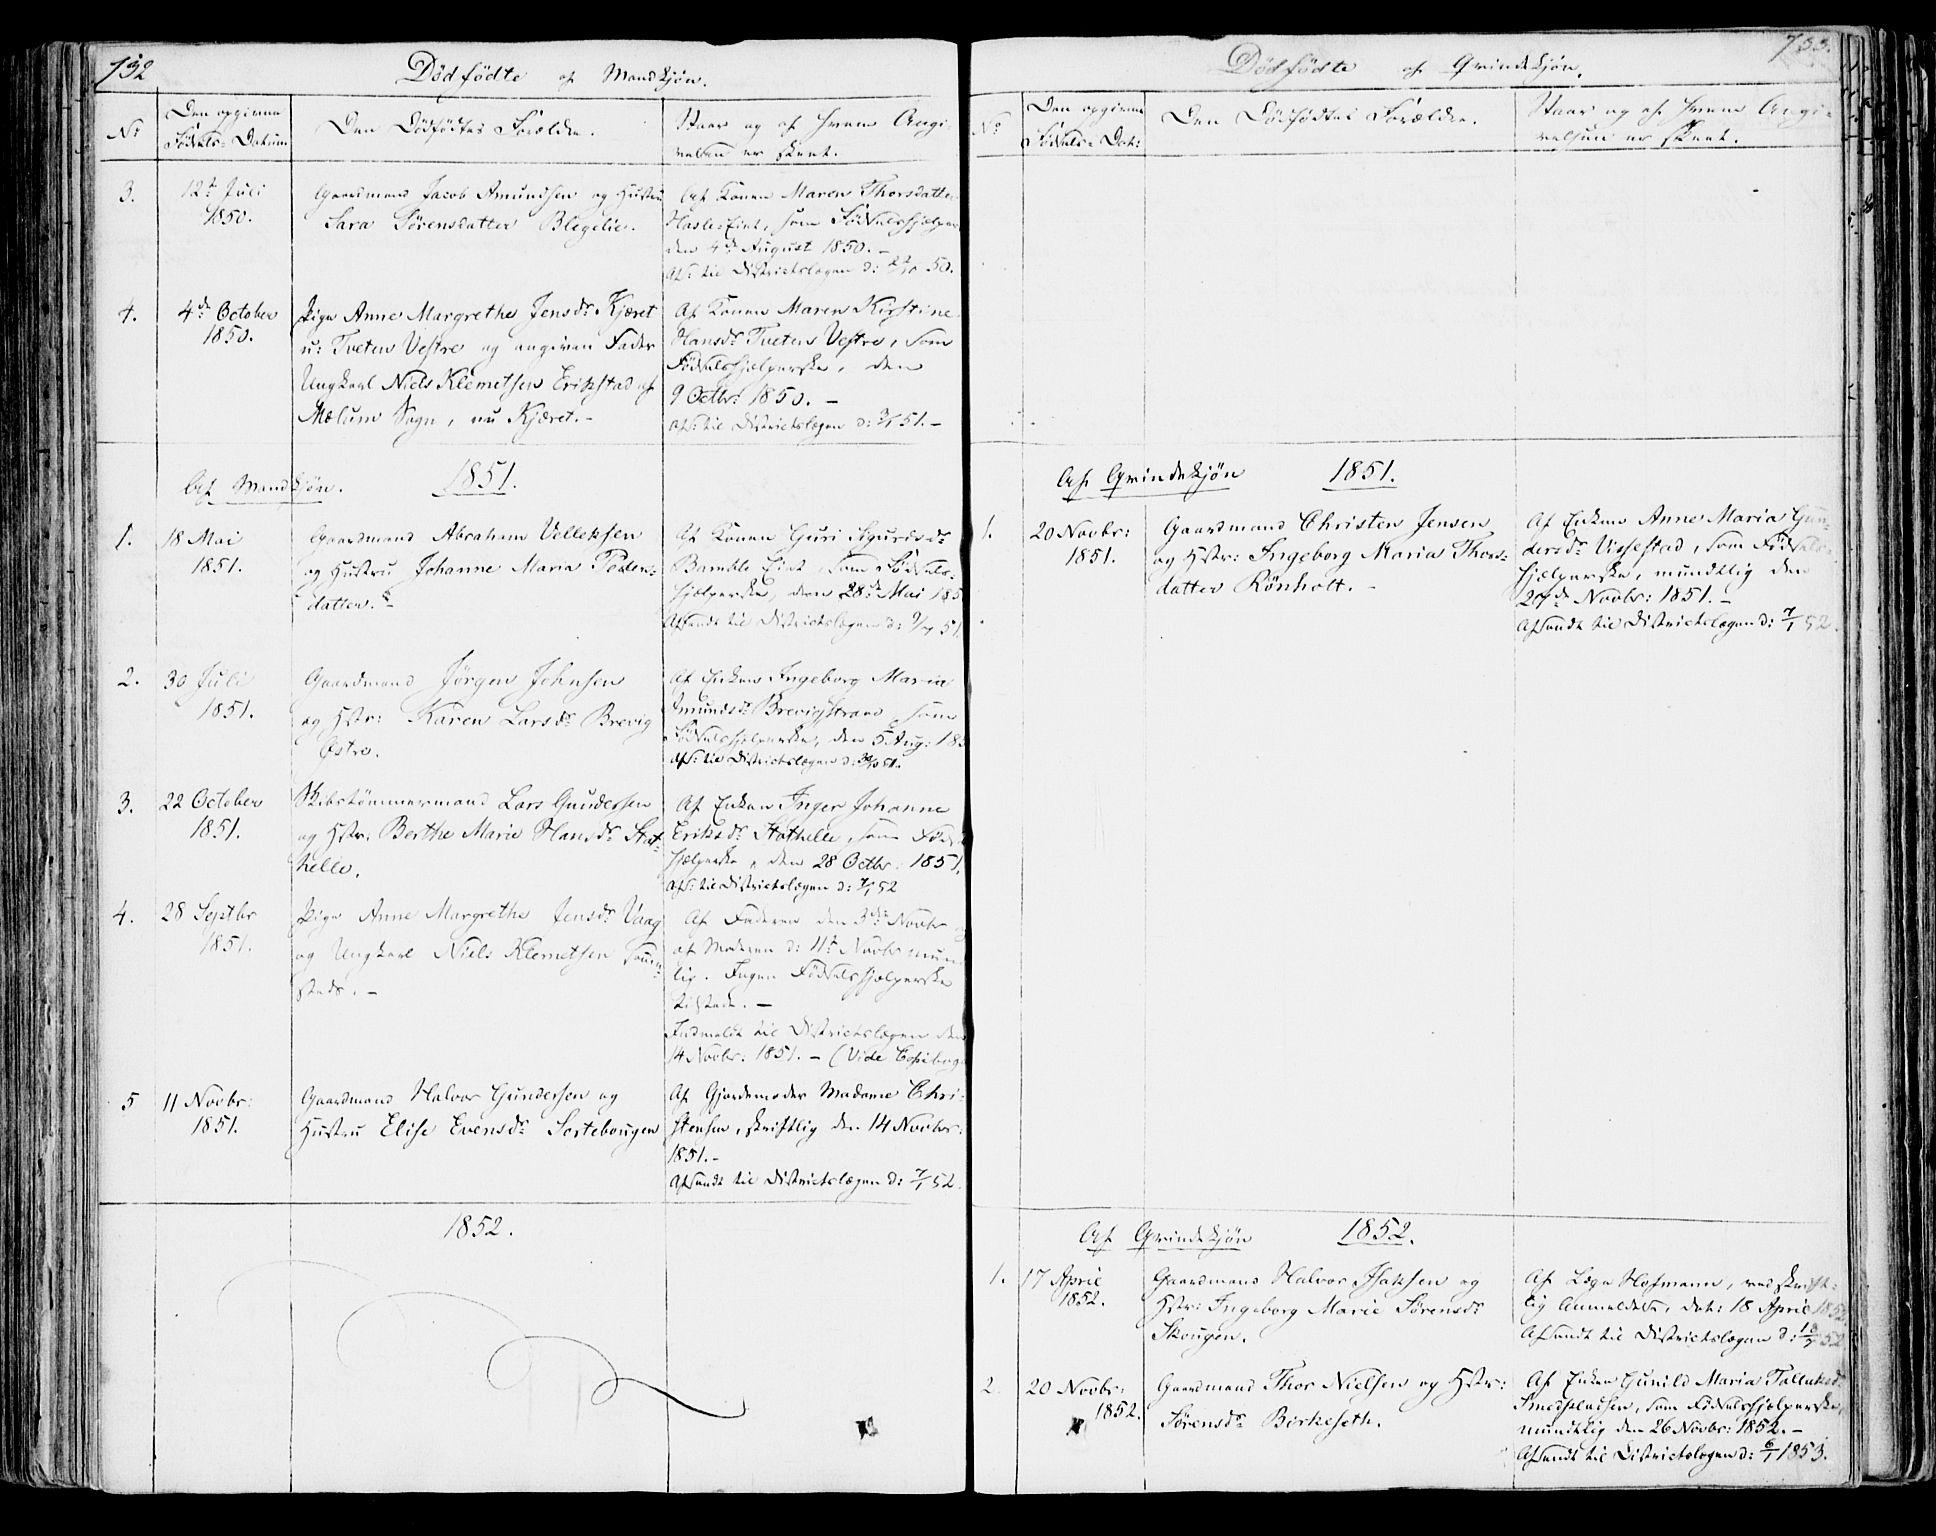 SAKO, Bamble kirkebøker, F/Fa/L0004: Ministerialbok nr. I 4, 1834-1853, s. 732-733